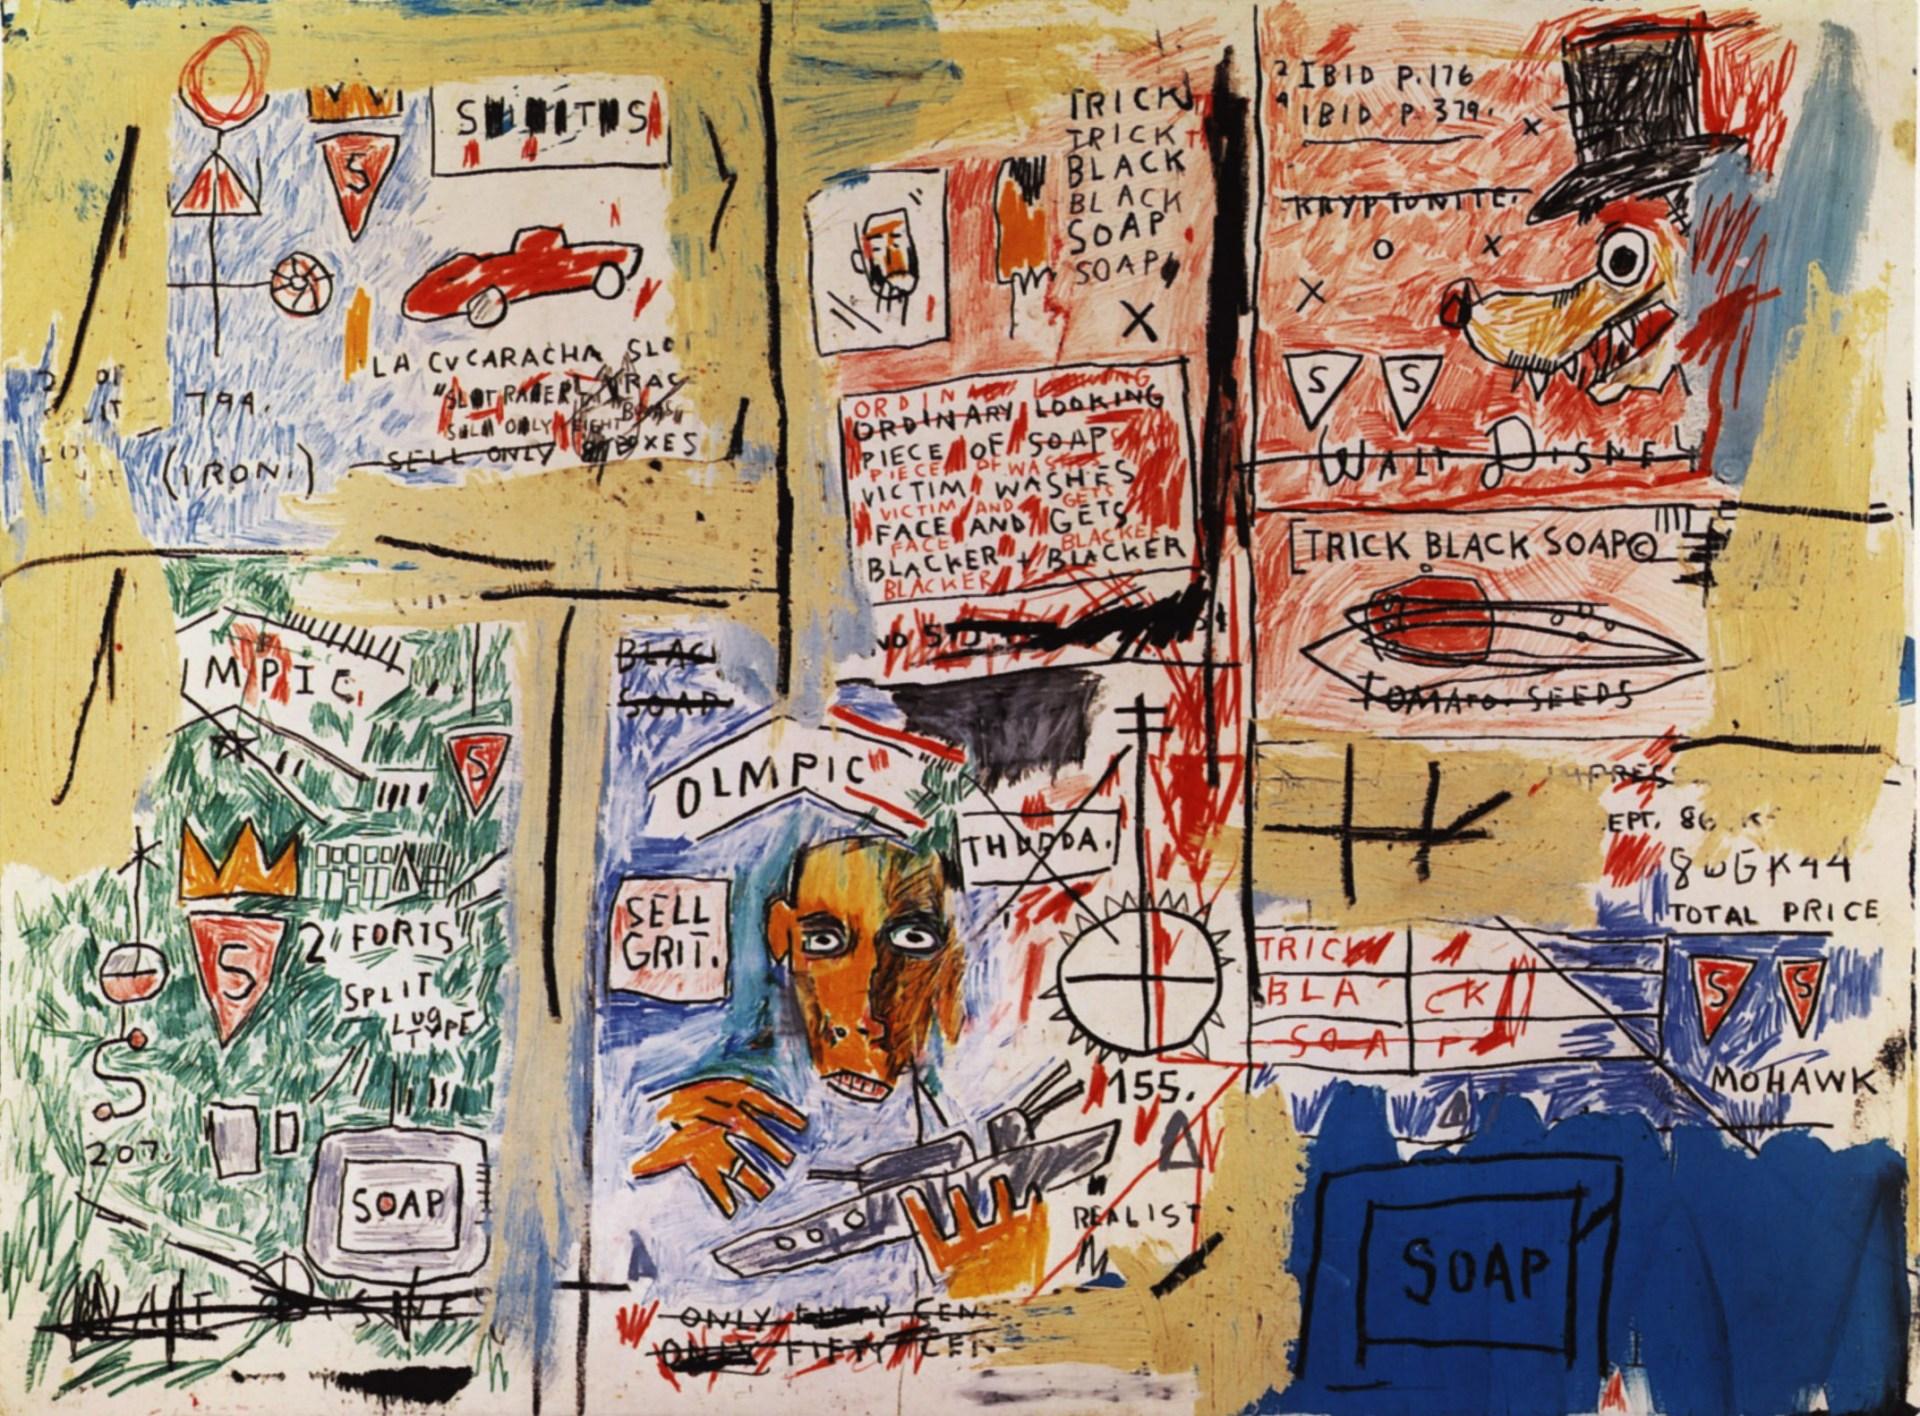 Top 50 de artistas contemporâneos, pela Artprice